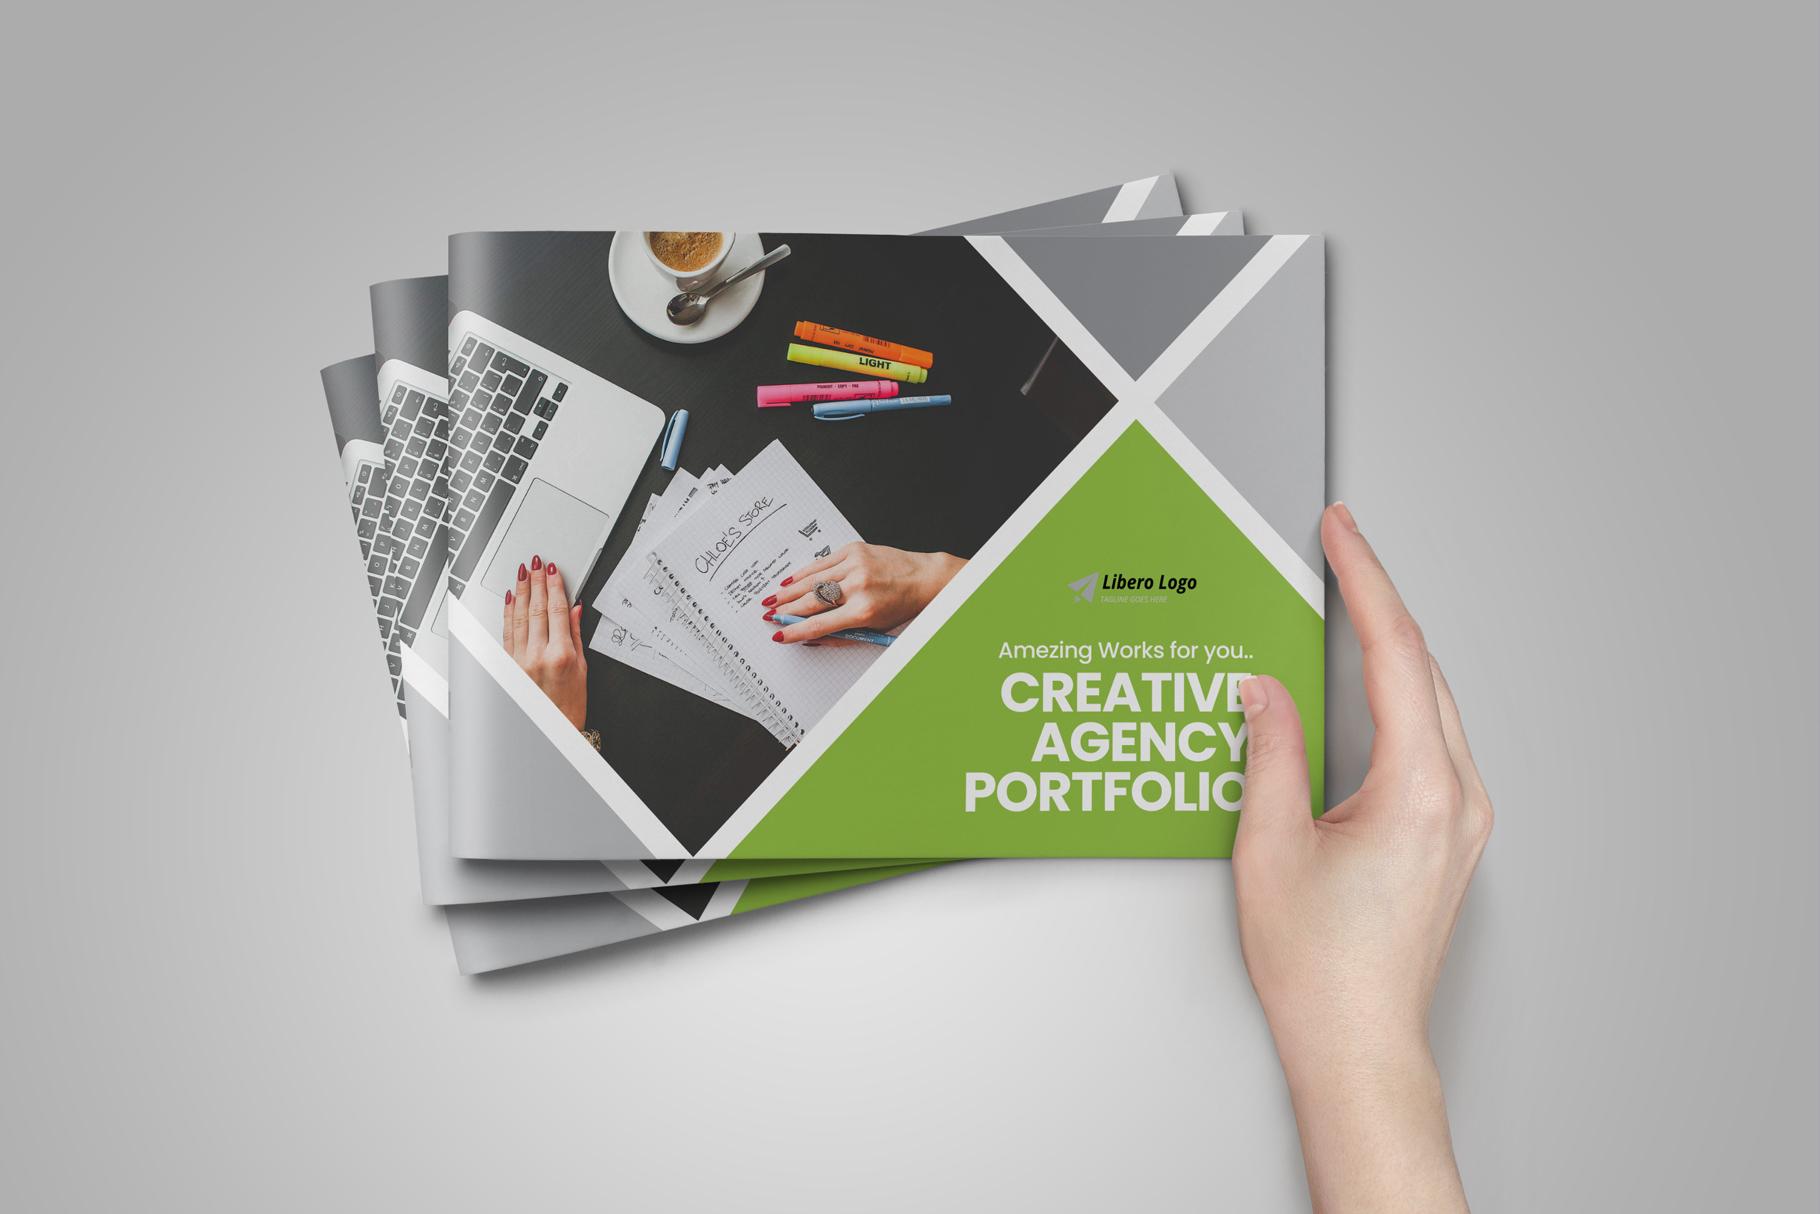 Digital Agency Portfolio Brochure v2 example image 12